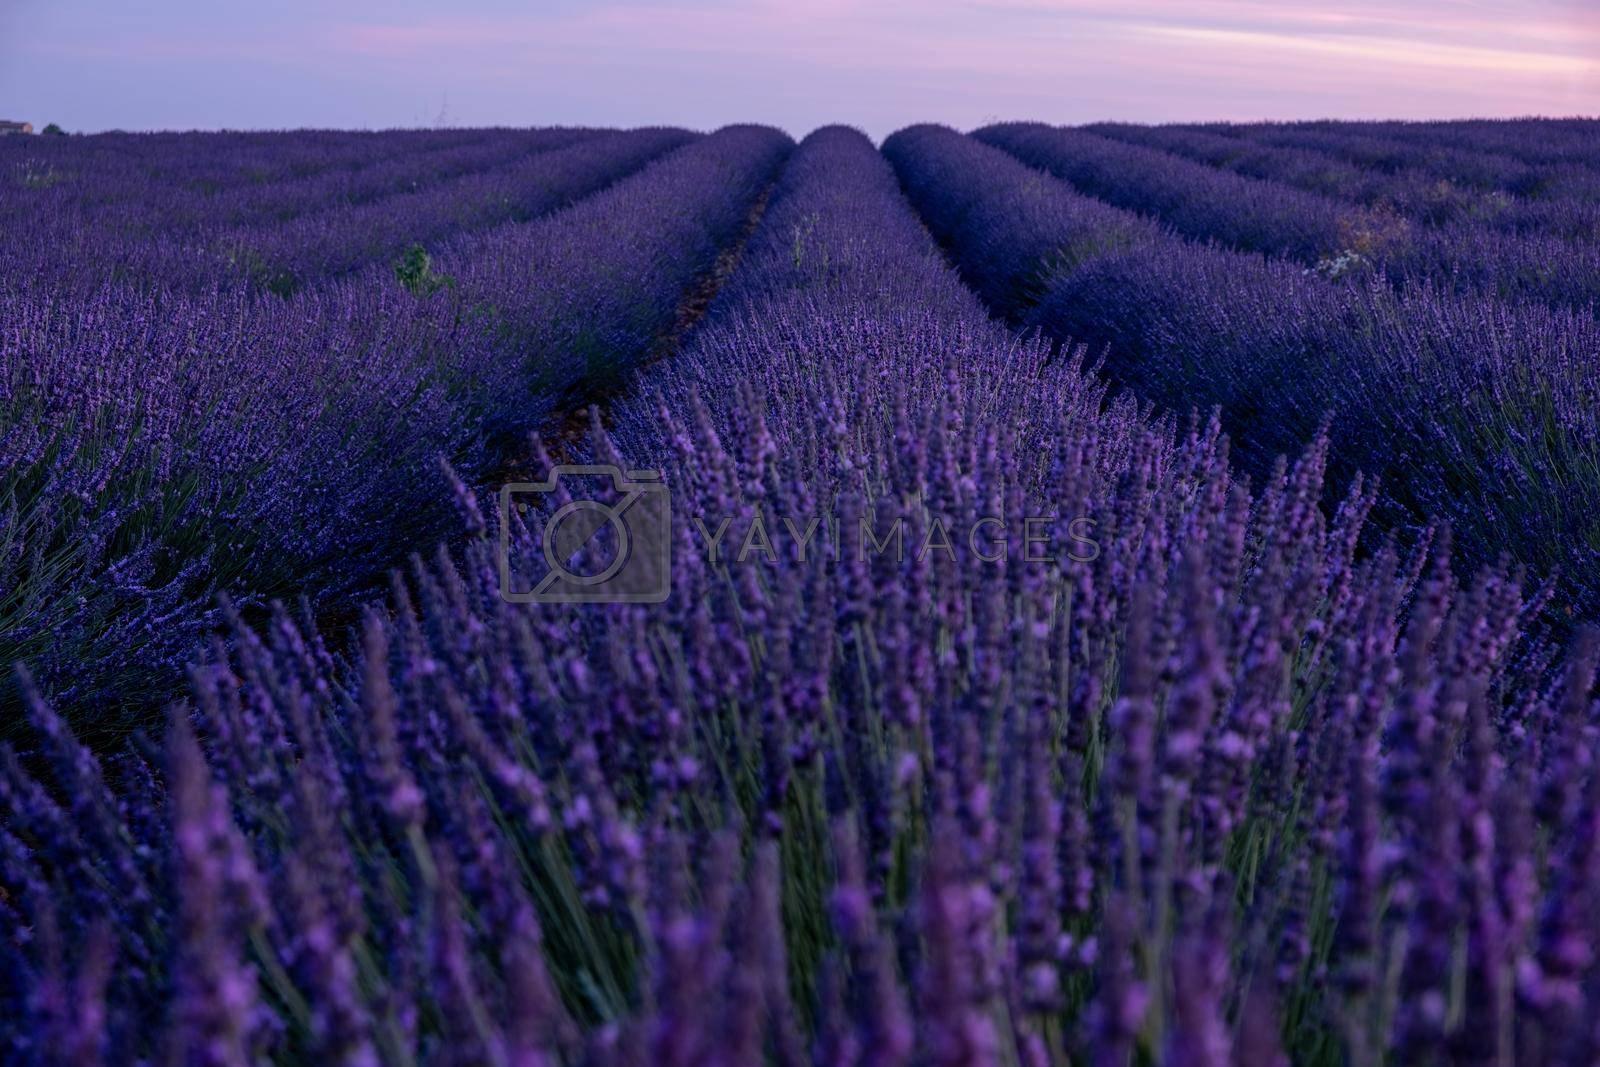 Provence, Lavender field France, Valensole Plateau, colorful field of Lavender Valensole Plateau, Provence, Southern France. Lavender field. Europe